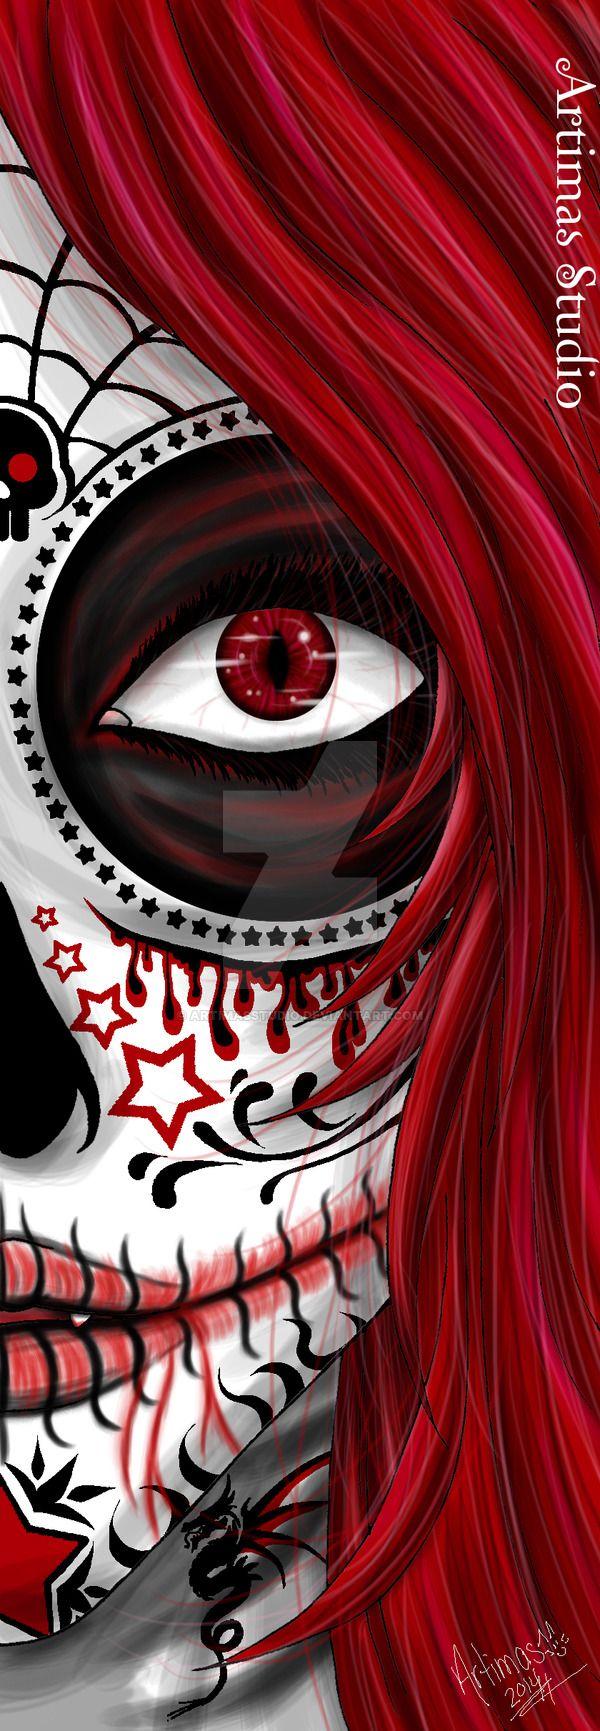 Red Death by ArtimasStudio.deviantart.com on @DeviantArt